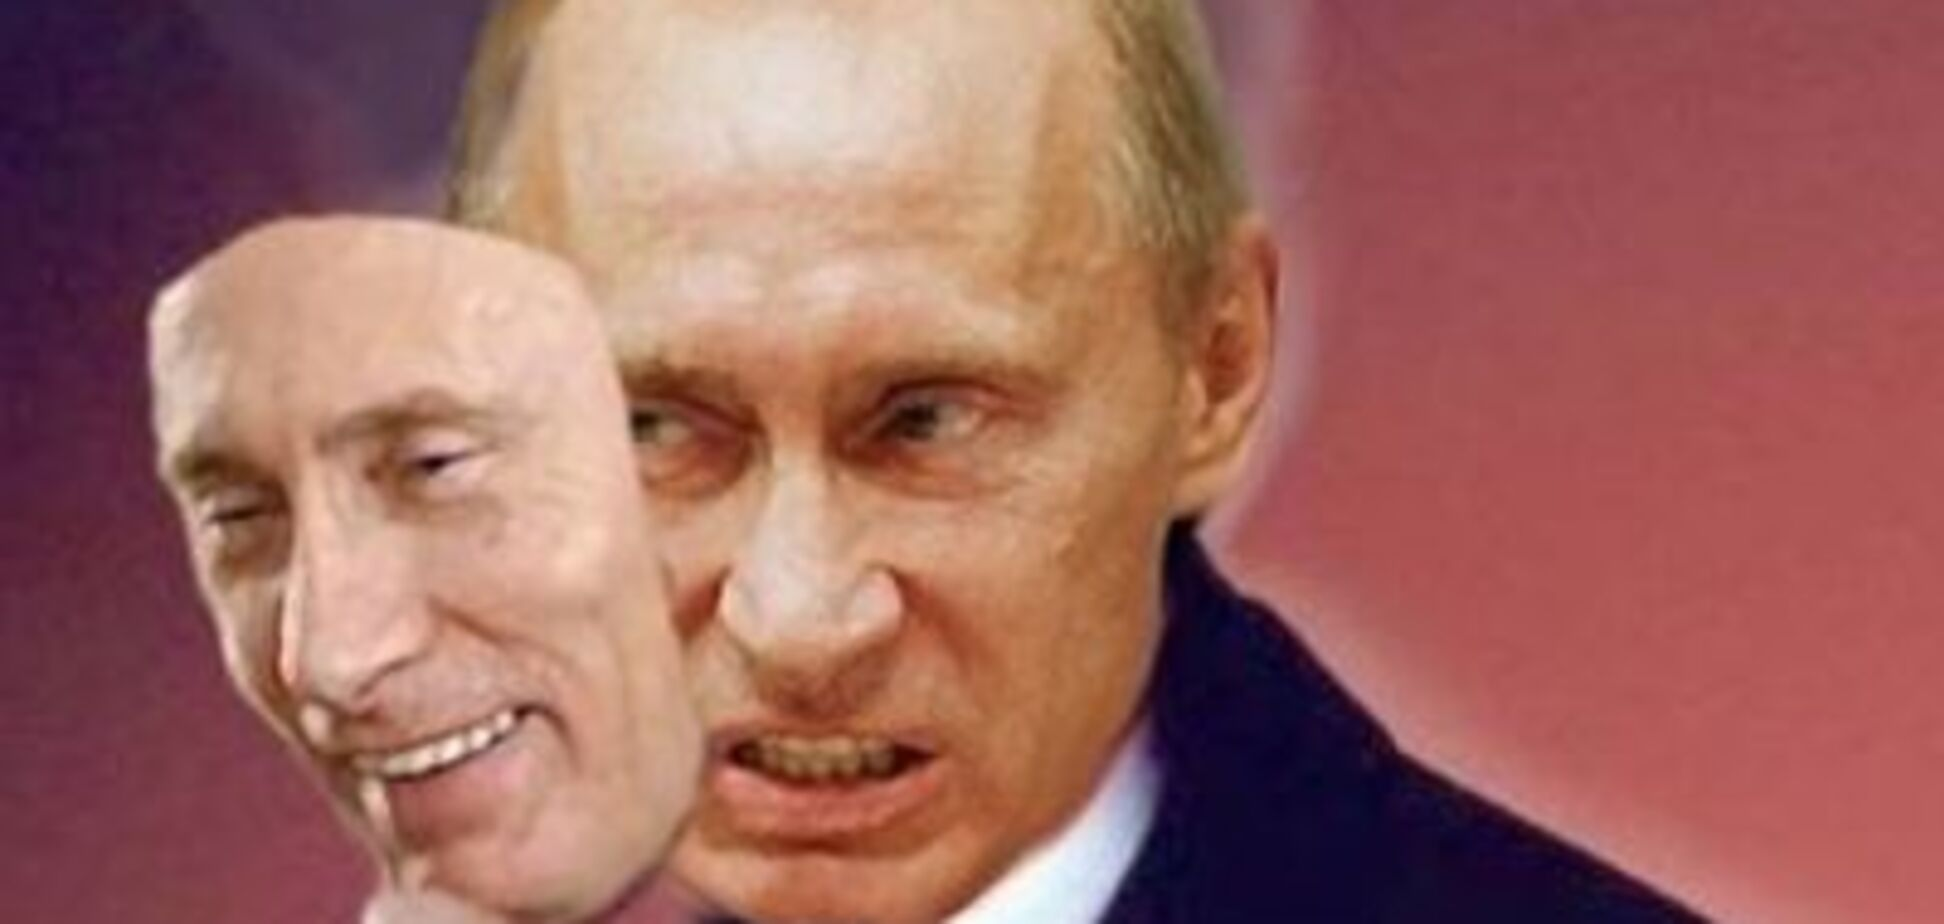 Путин выберет нашу судьбу за нас